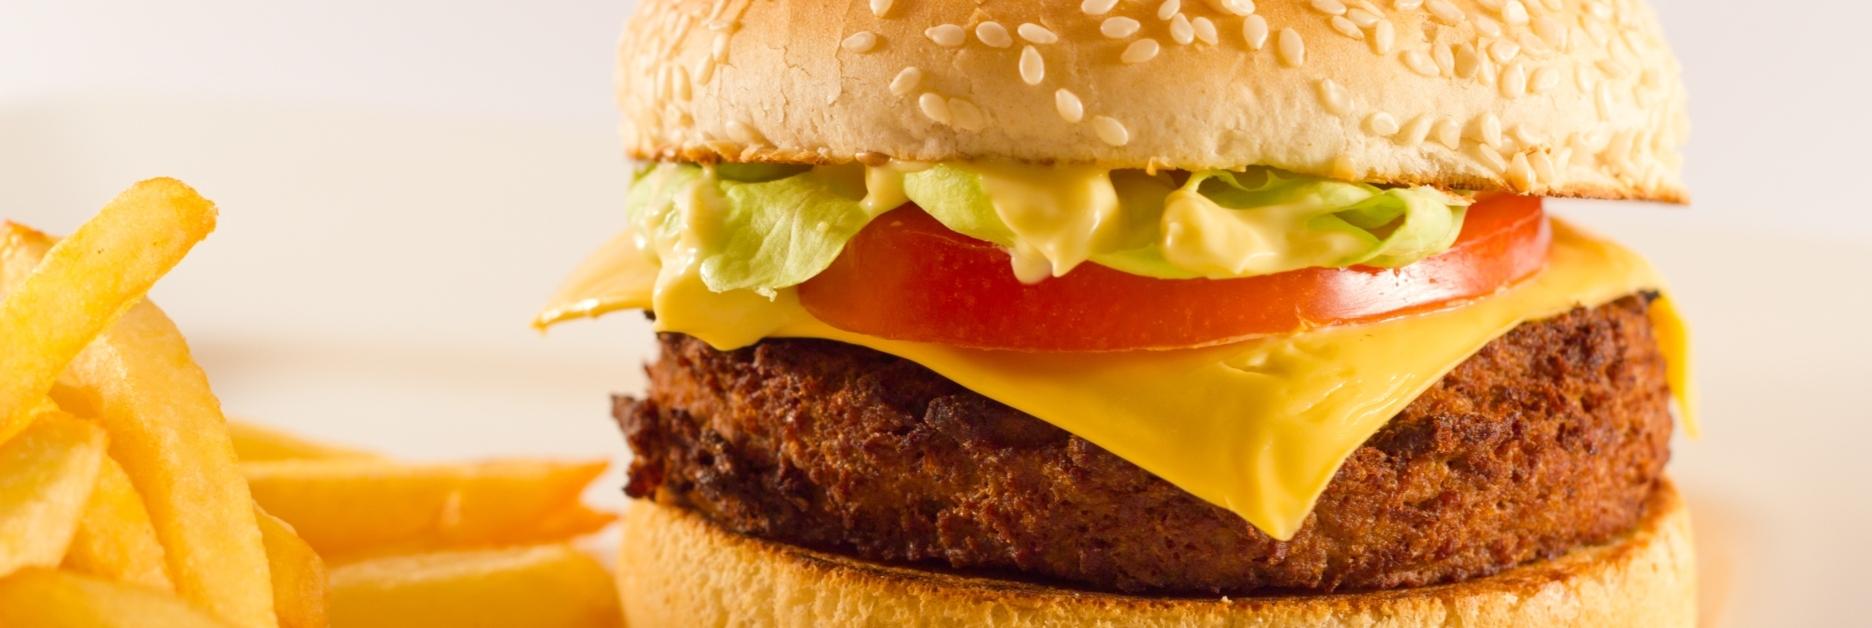 cheeseburger american